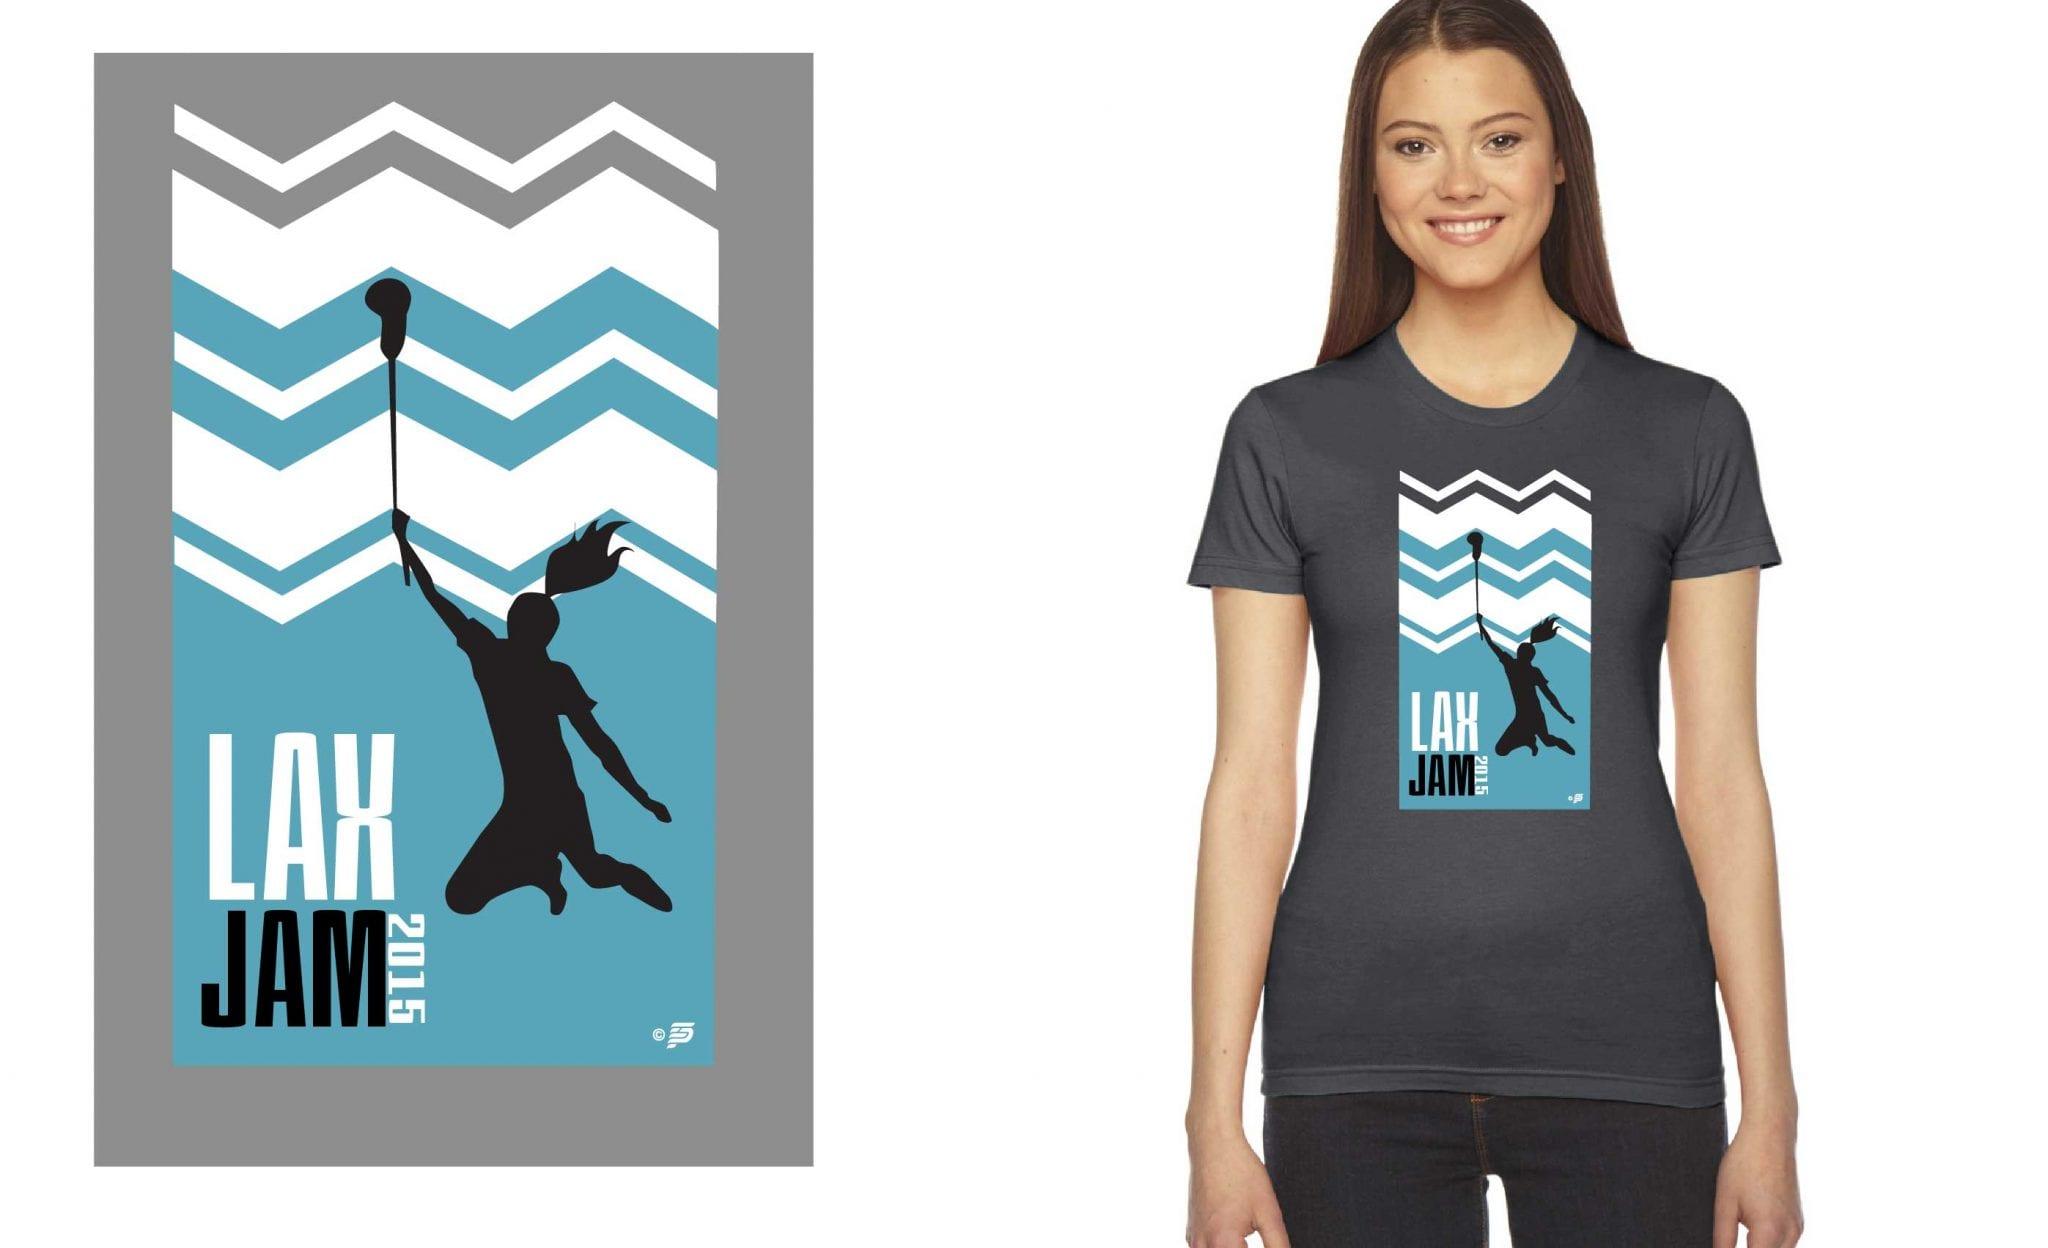 2015 LAX JAM tshirt design